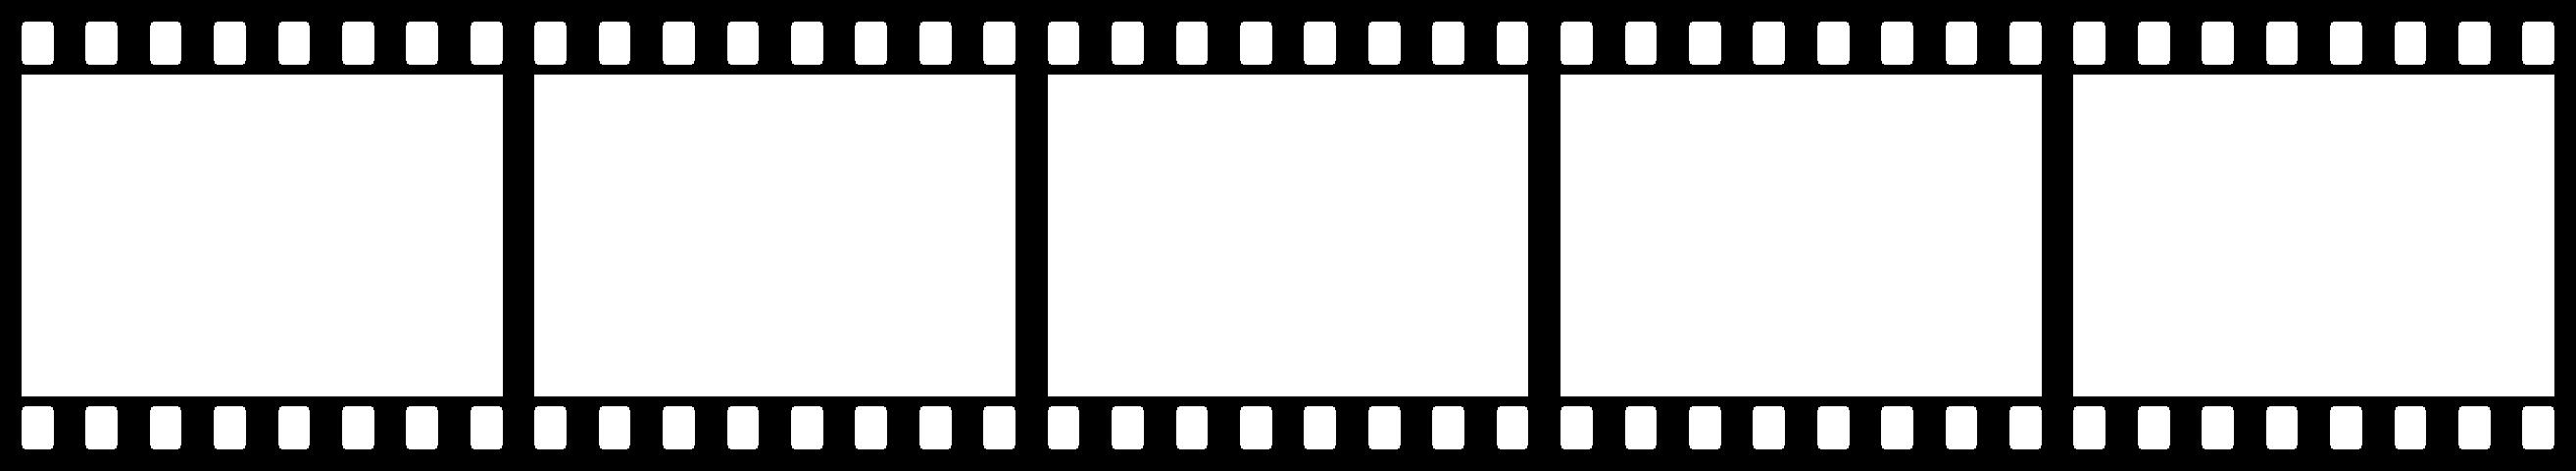 free kino online